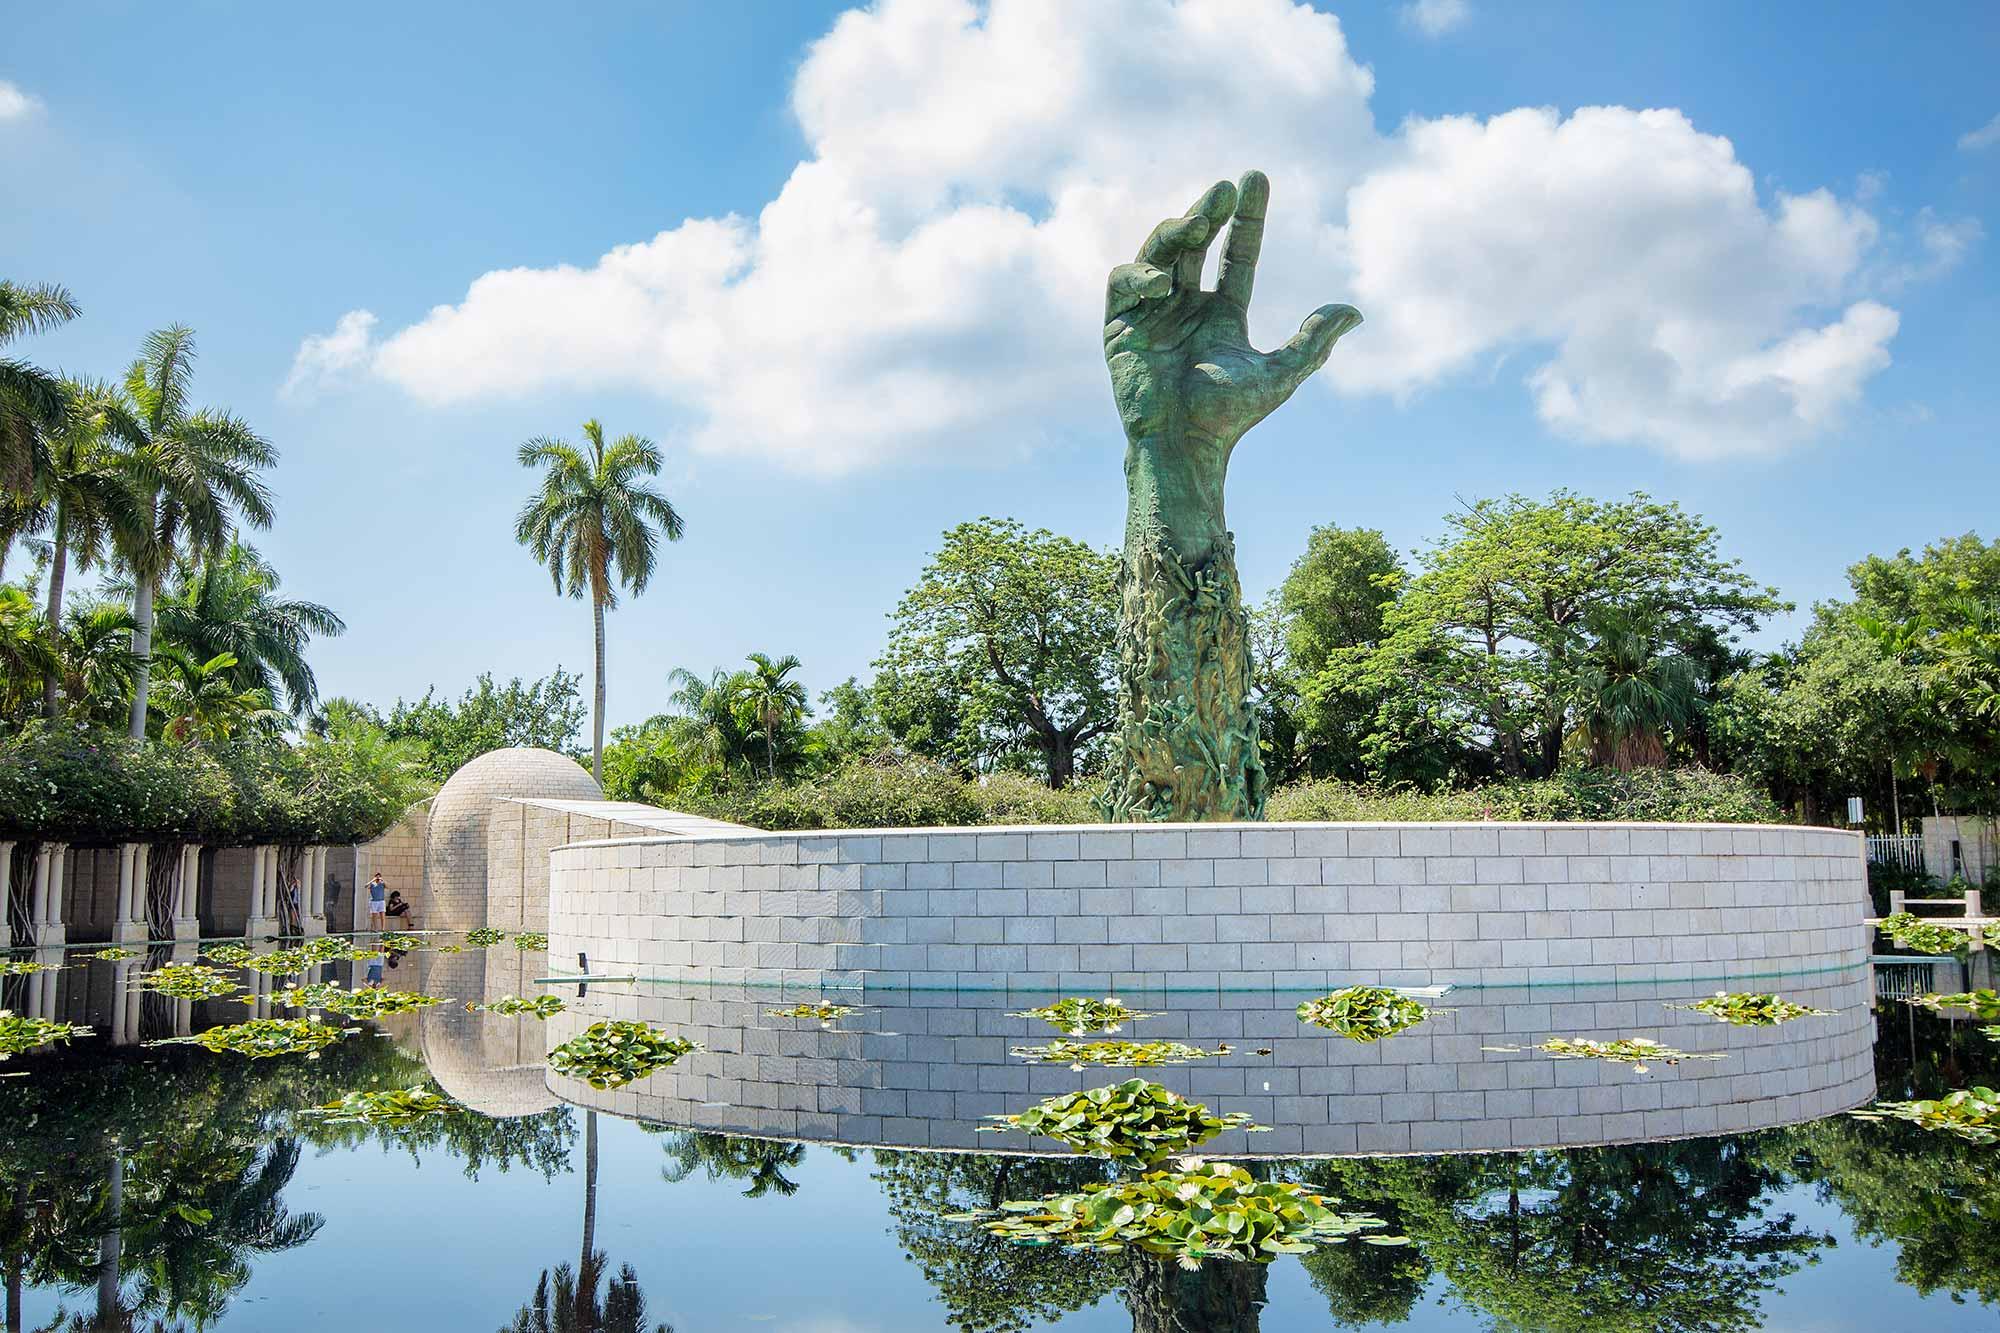 miami-beach-holocaust-memorial-14 - enjoy miami beach